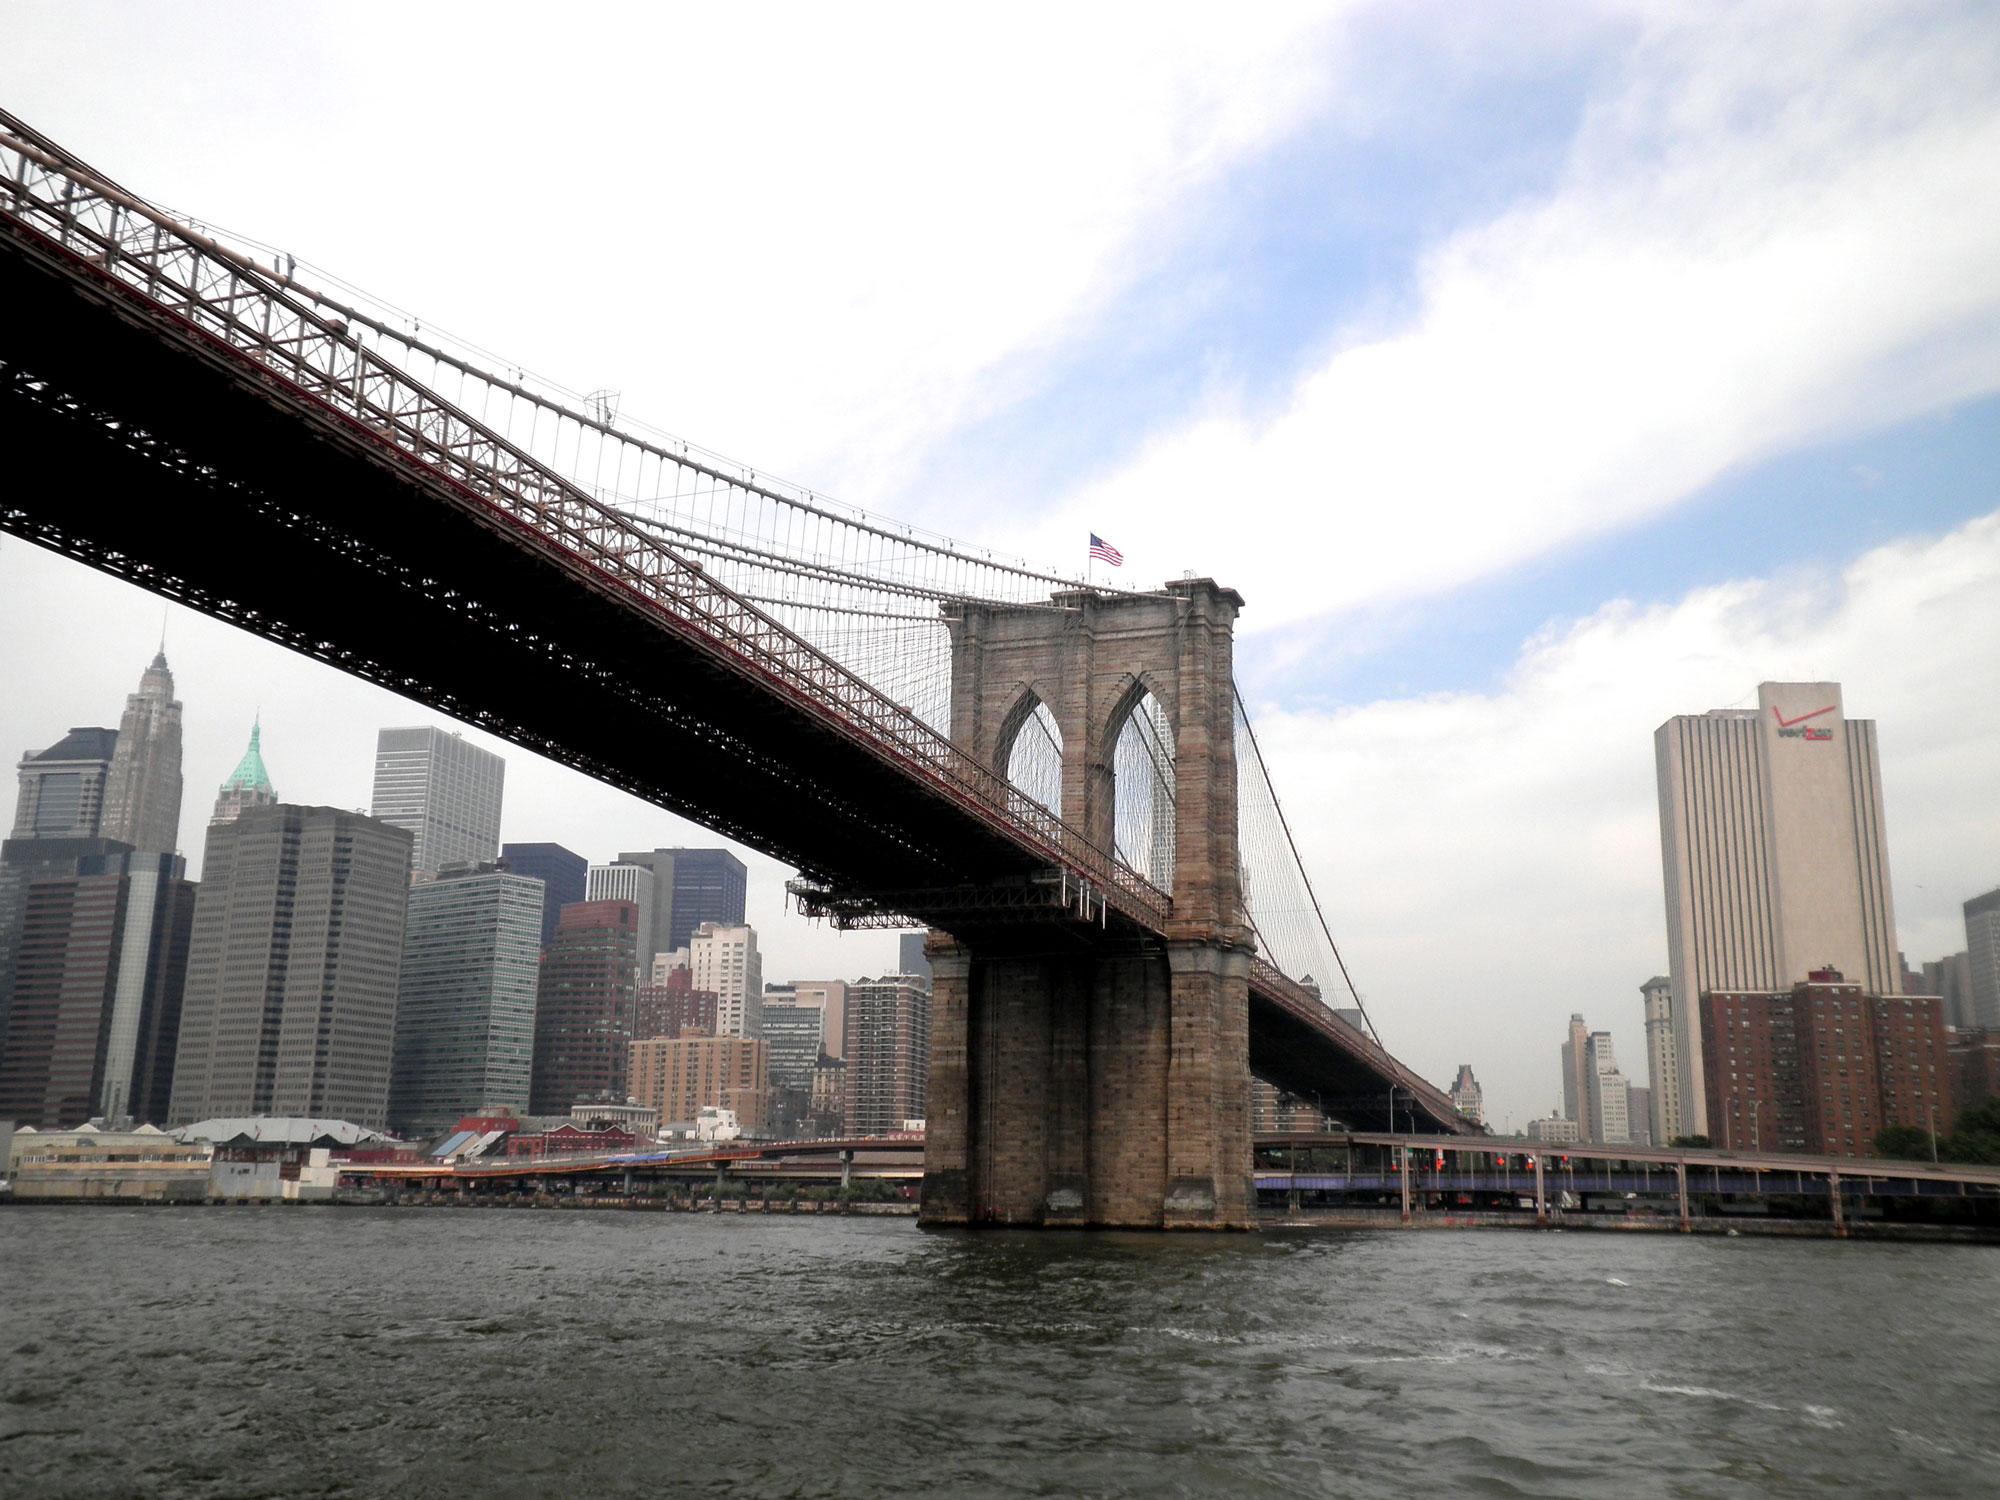 The iconic Brooklyn Bridge, New York City